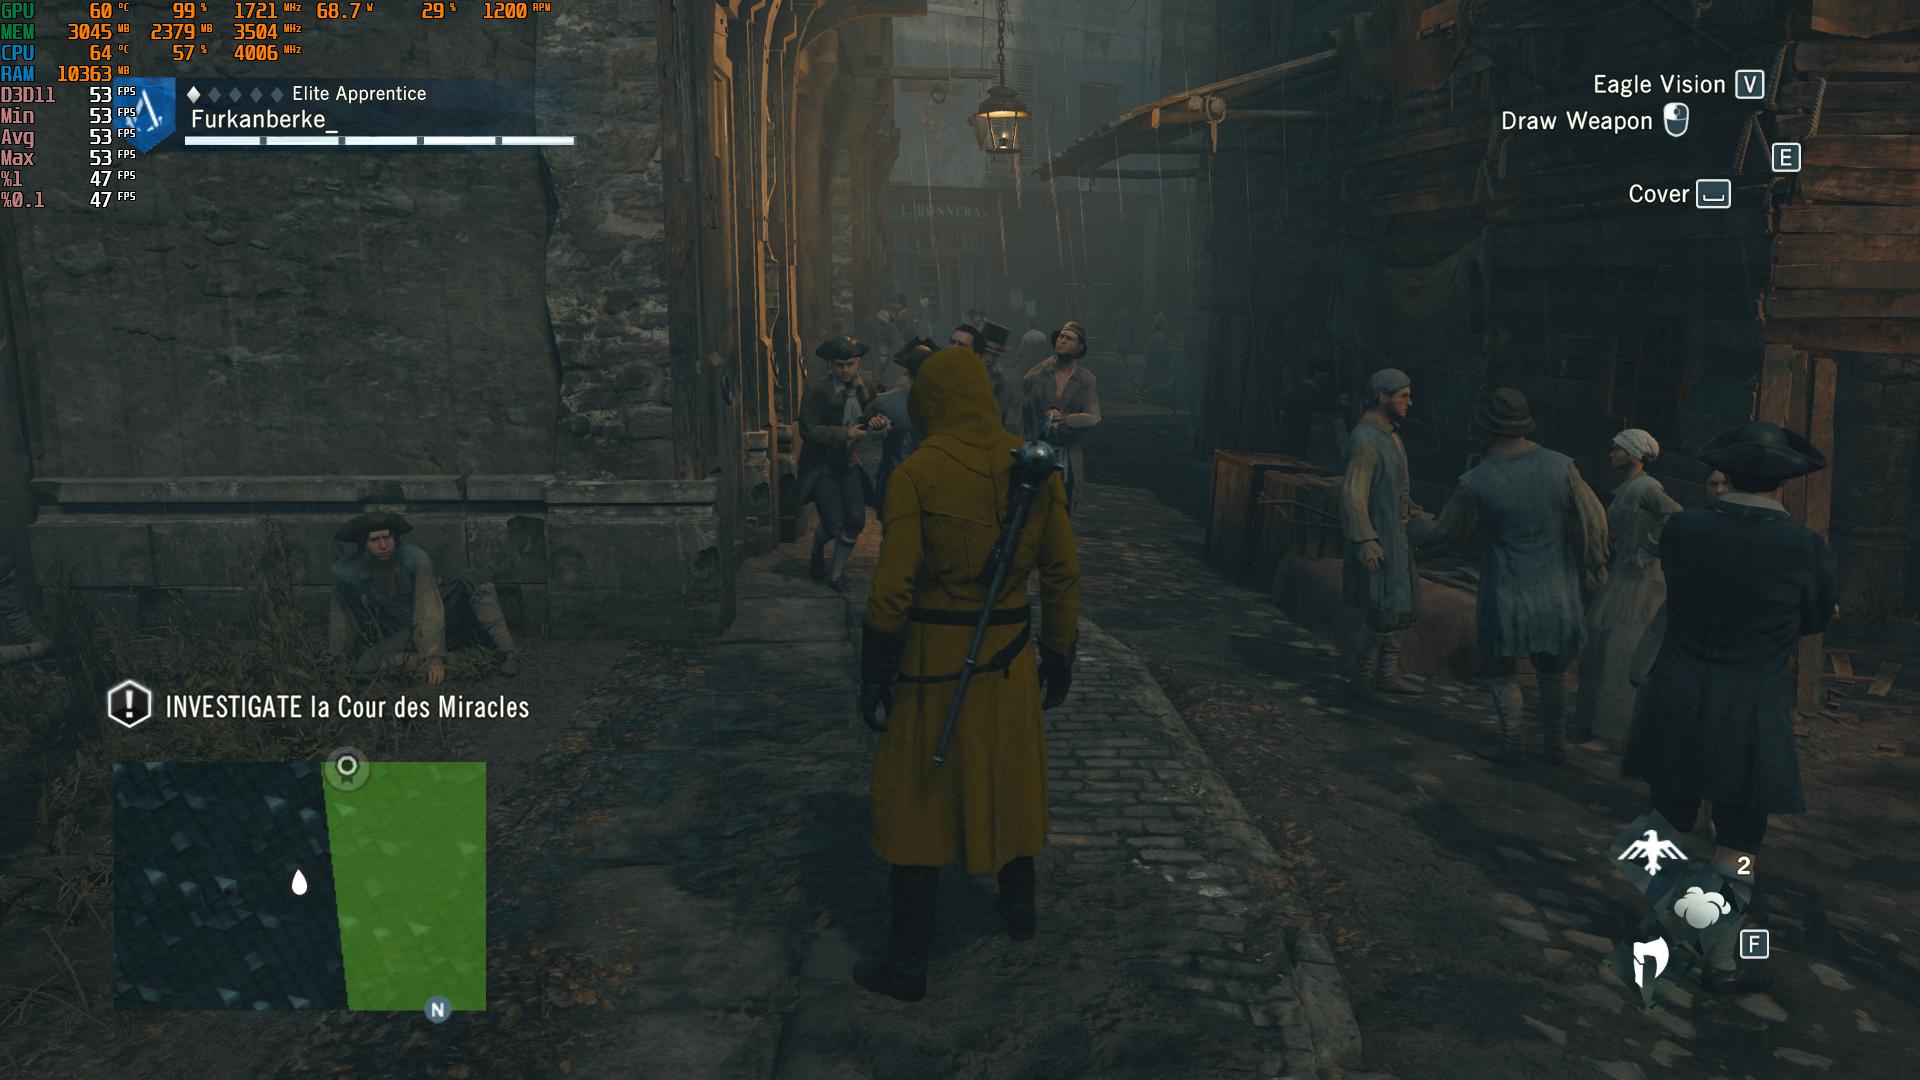 Assassin's Creed  Unity Screenshot 2021.05.06 - 14.44.32.20.png